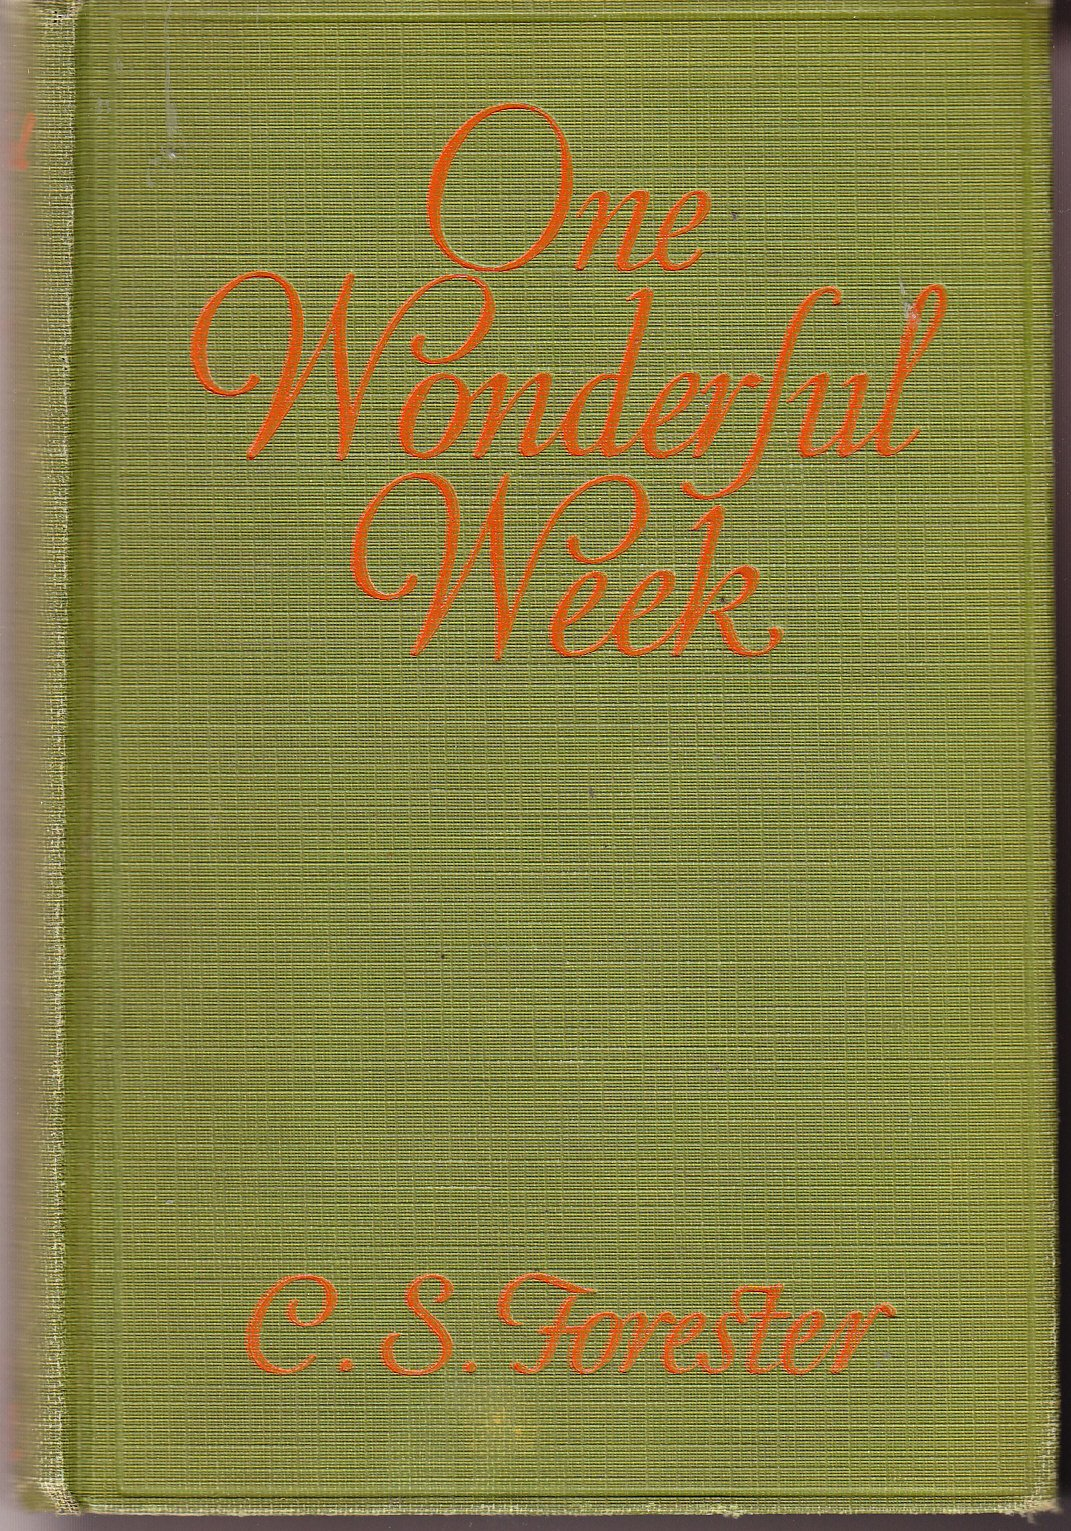 One Wonderful Week: C. S. Forester: Amazon.com: Books